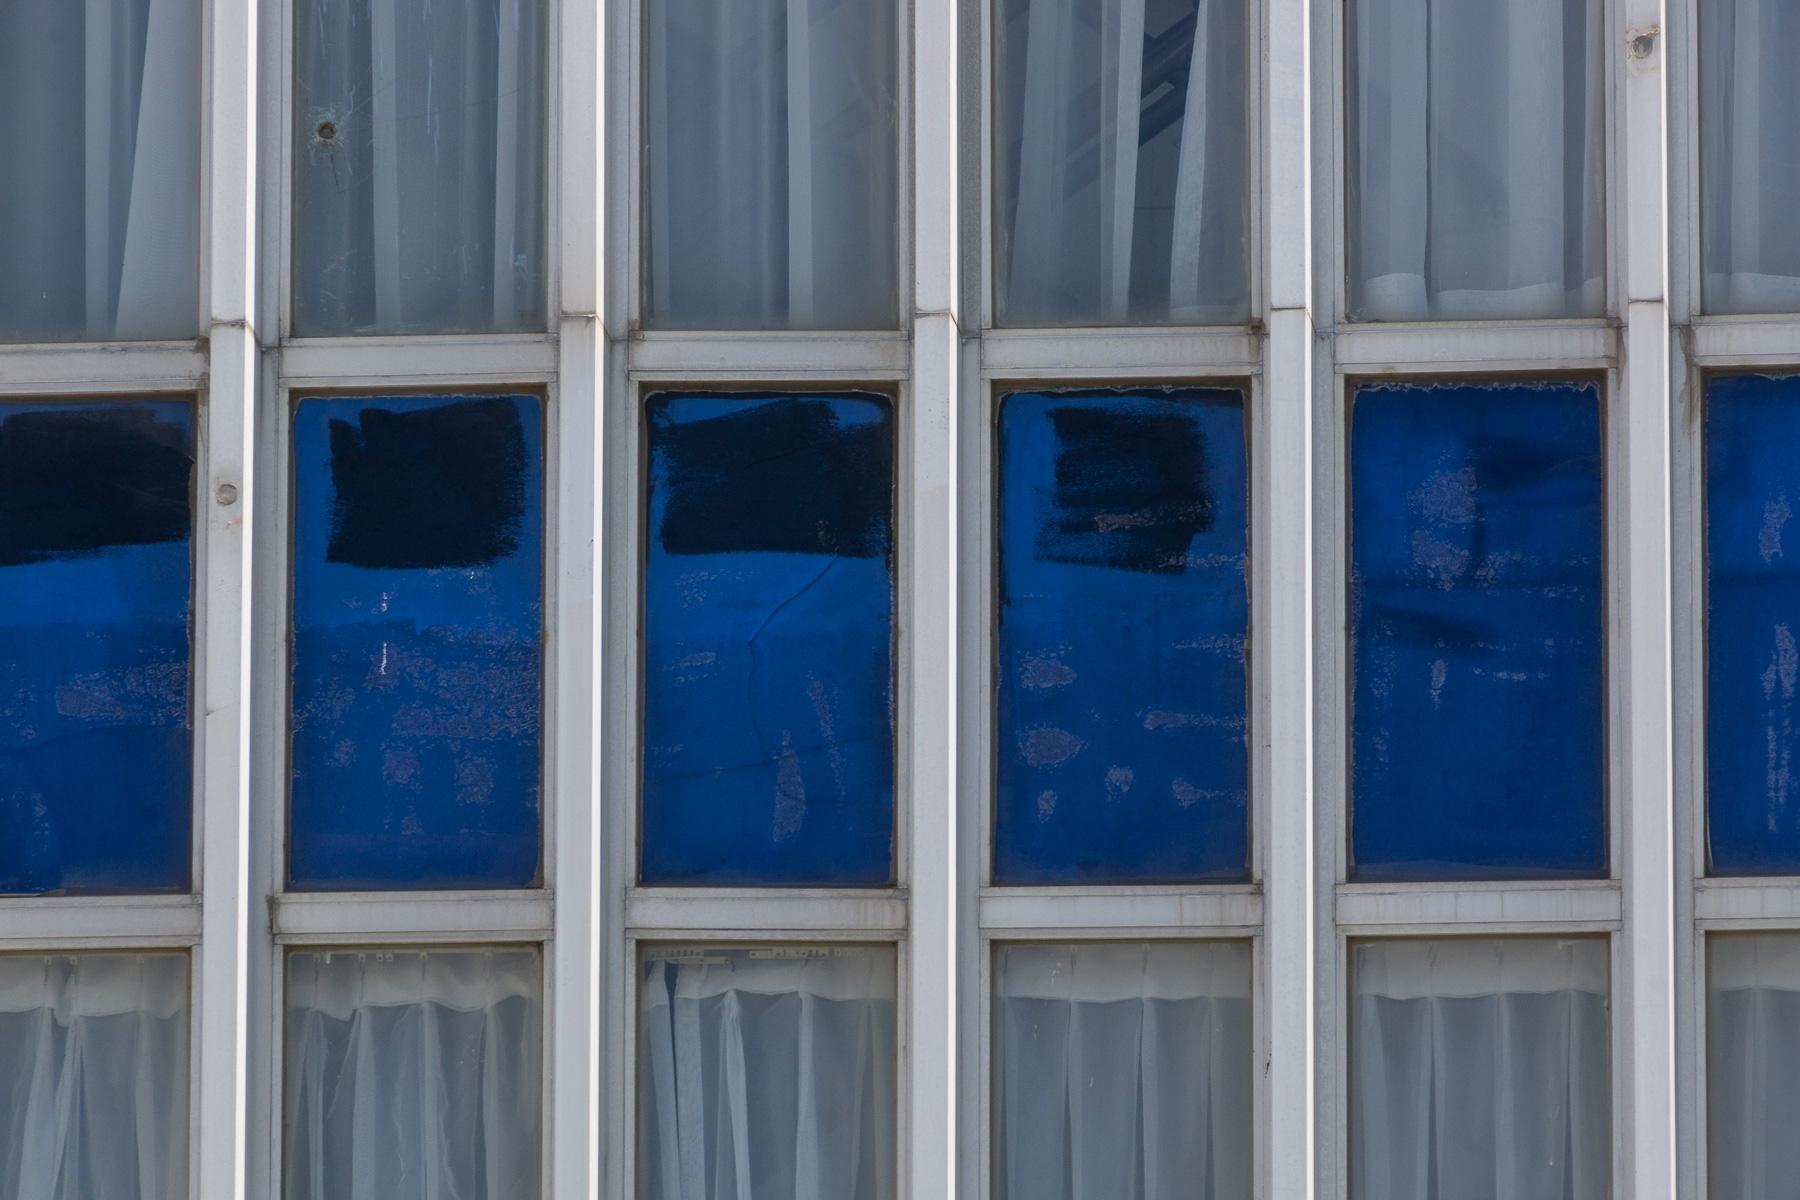 Windows and Steel